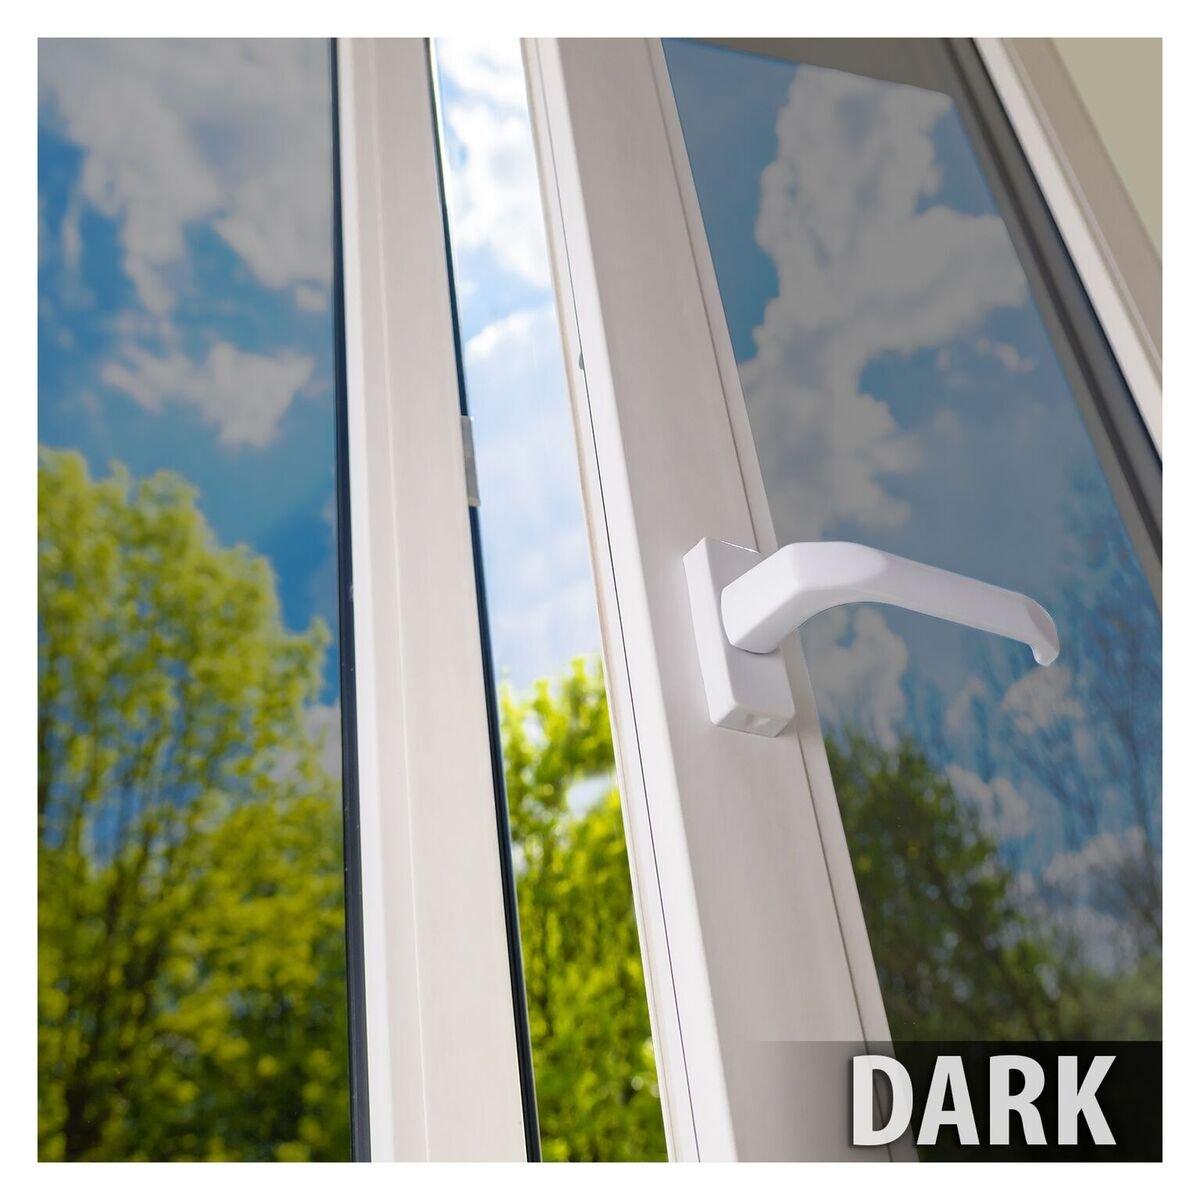 BDF S15 Window Film One Way Mirror Silver 15 (Dark) - 48in X 100ft by Buydecorativefilm (Image #5)